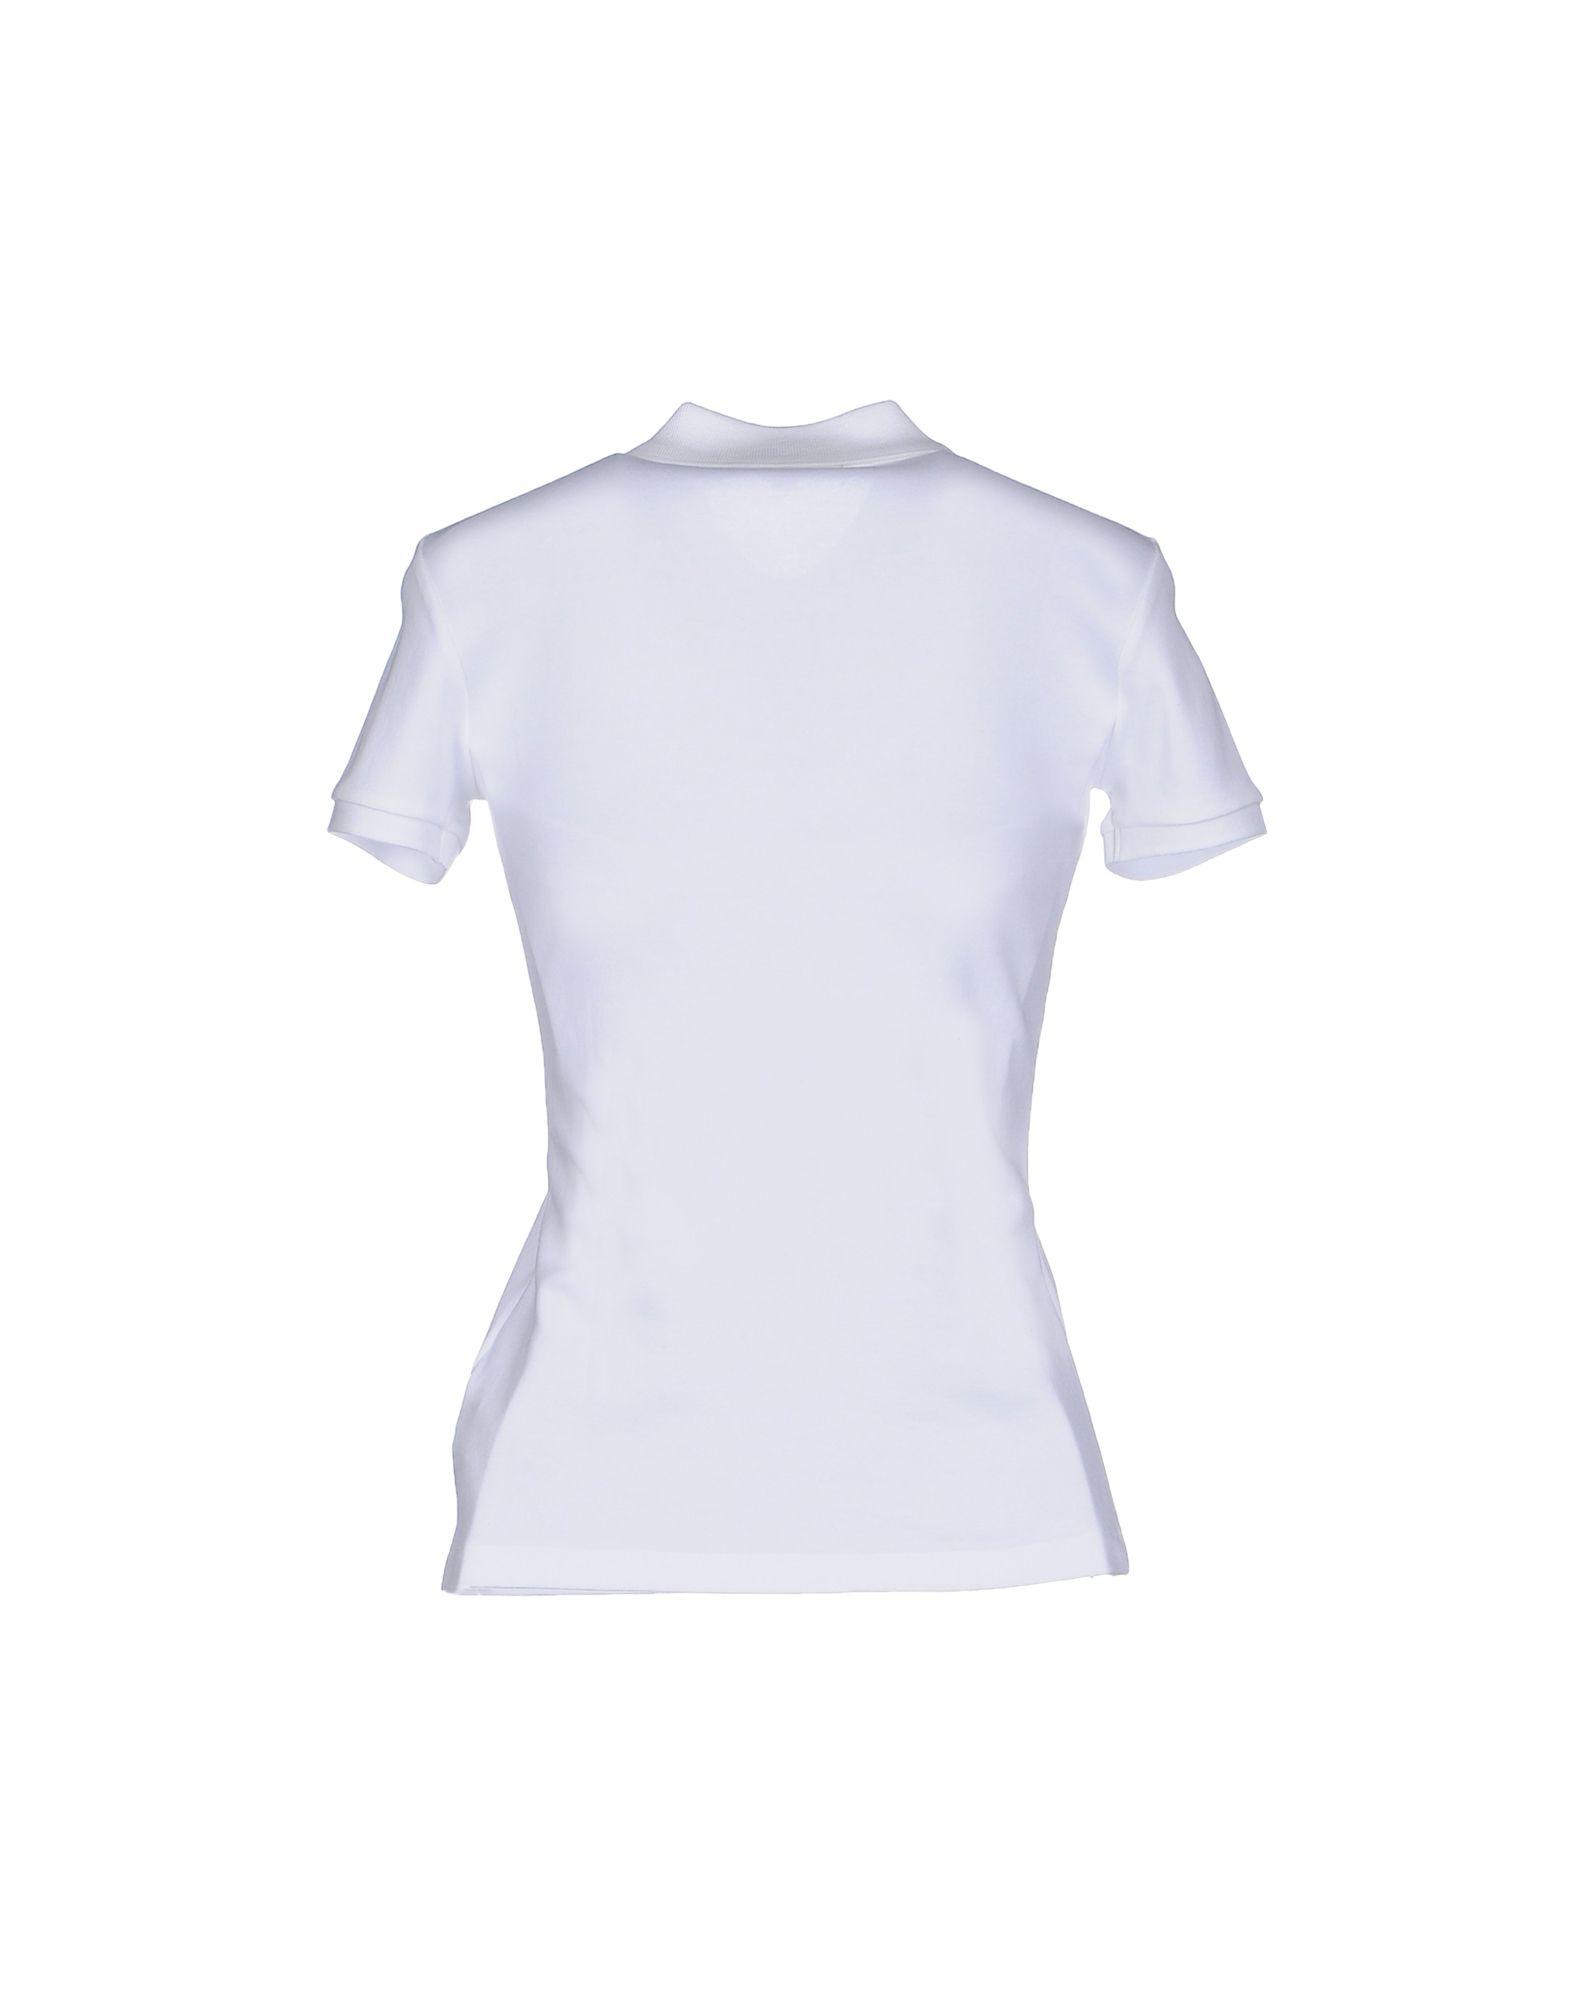 Ralph lauren black label polo shirt in white lyst for Ralph lauren black label polo shirt